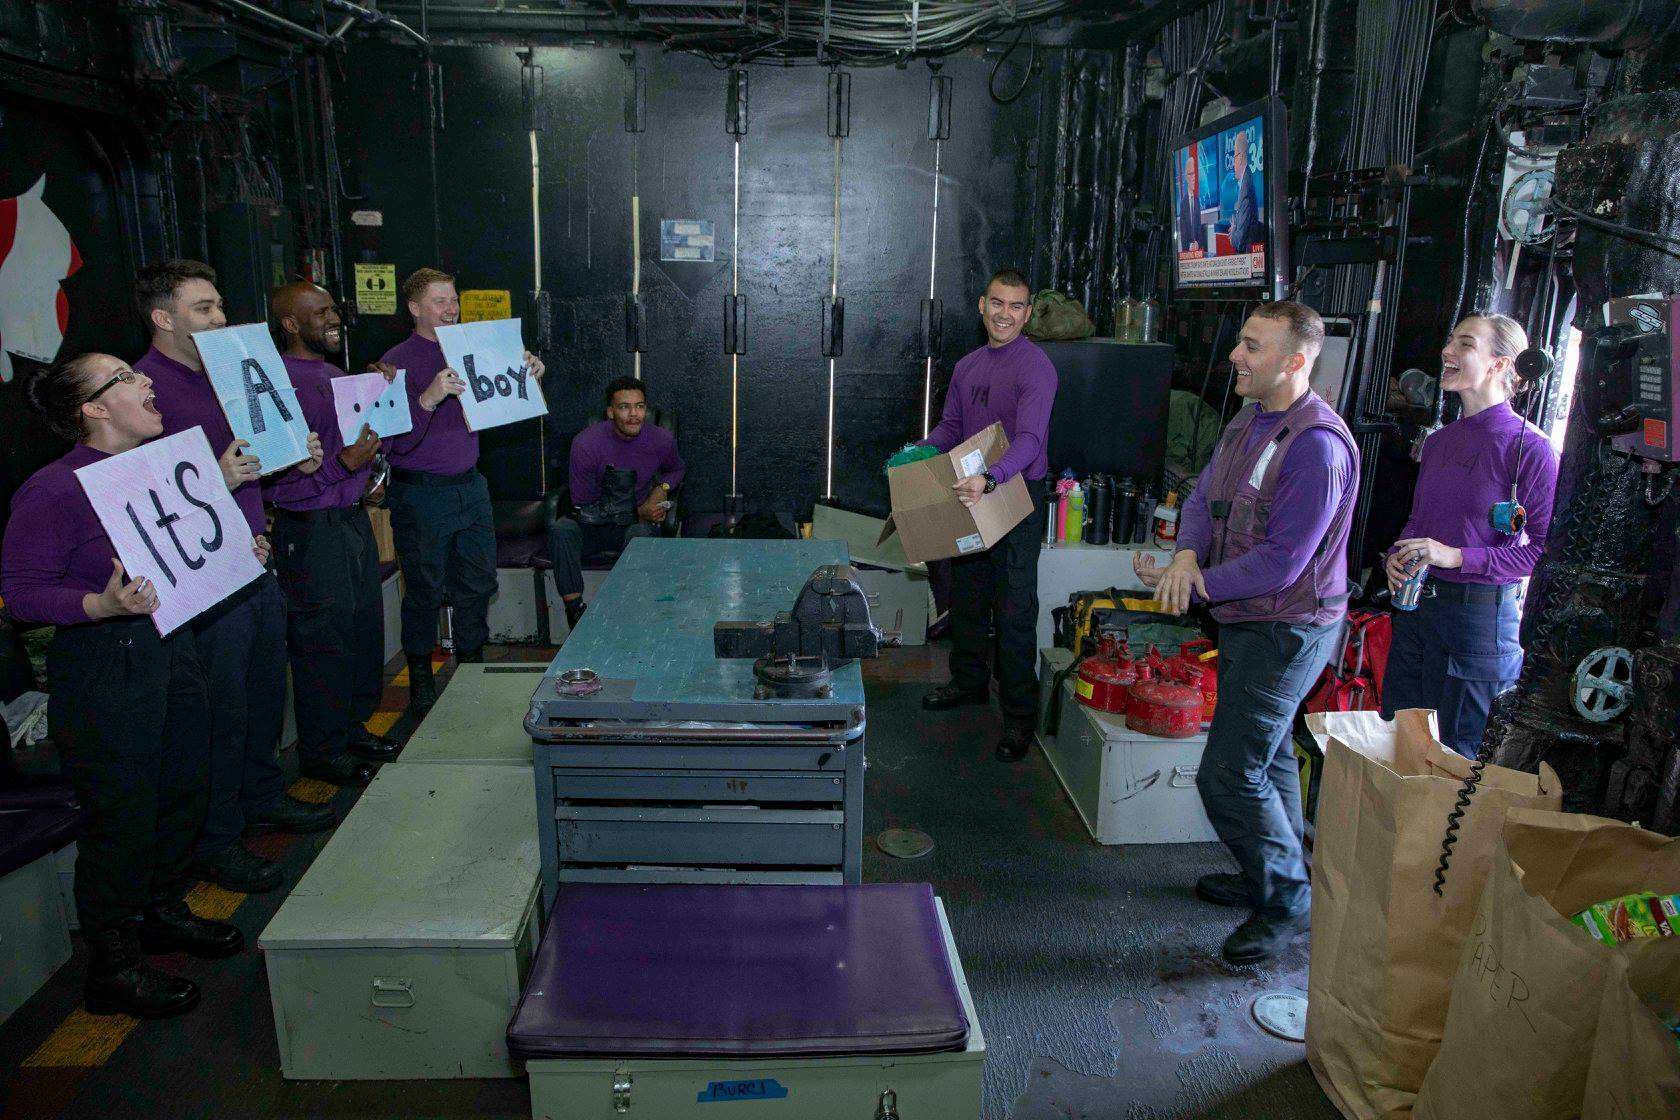 Photos: Shipmates hold surprise gender reveal for deployed Sailor on localship